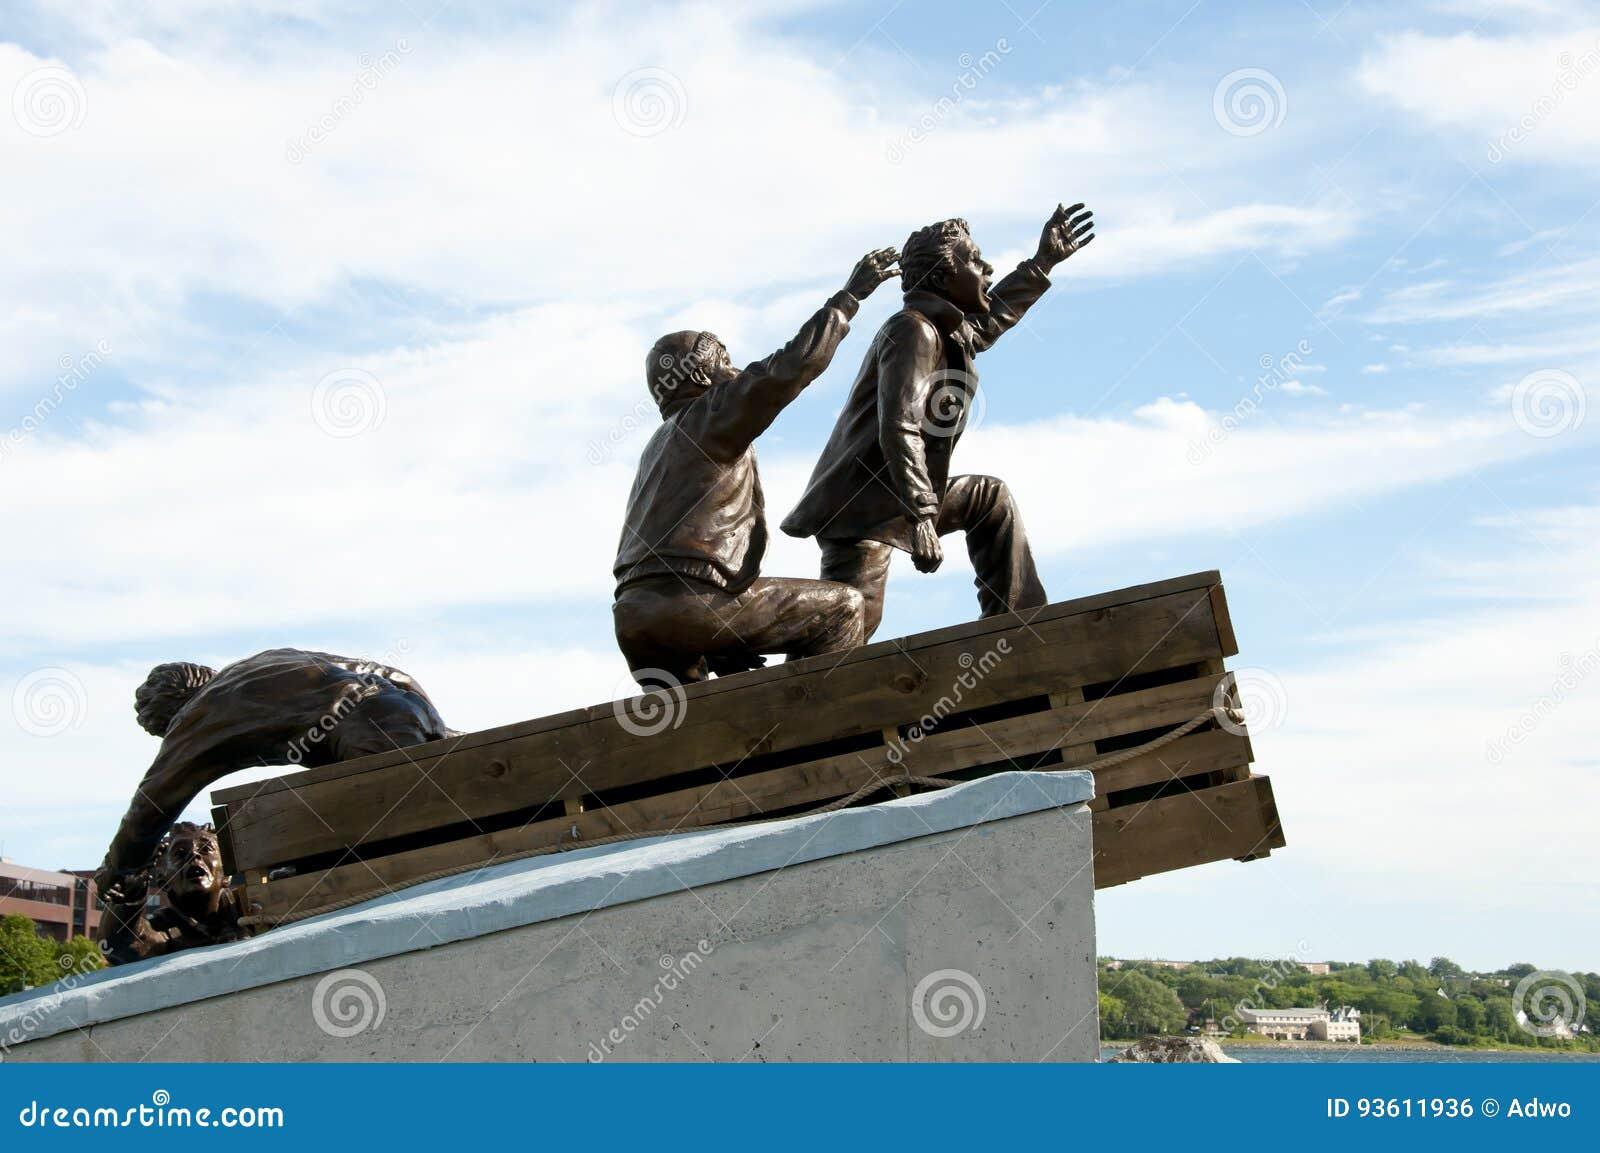 Merchant Mariner Public Monument - Sydney - Nova Scotia